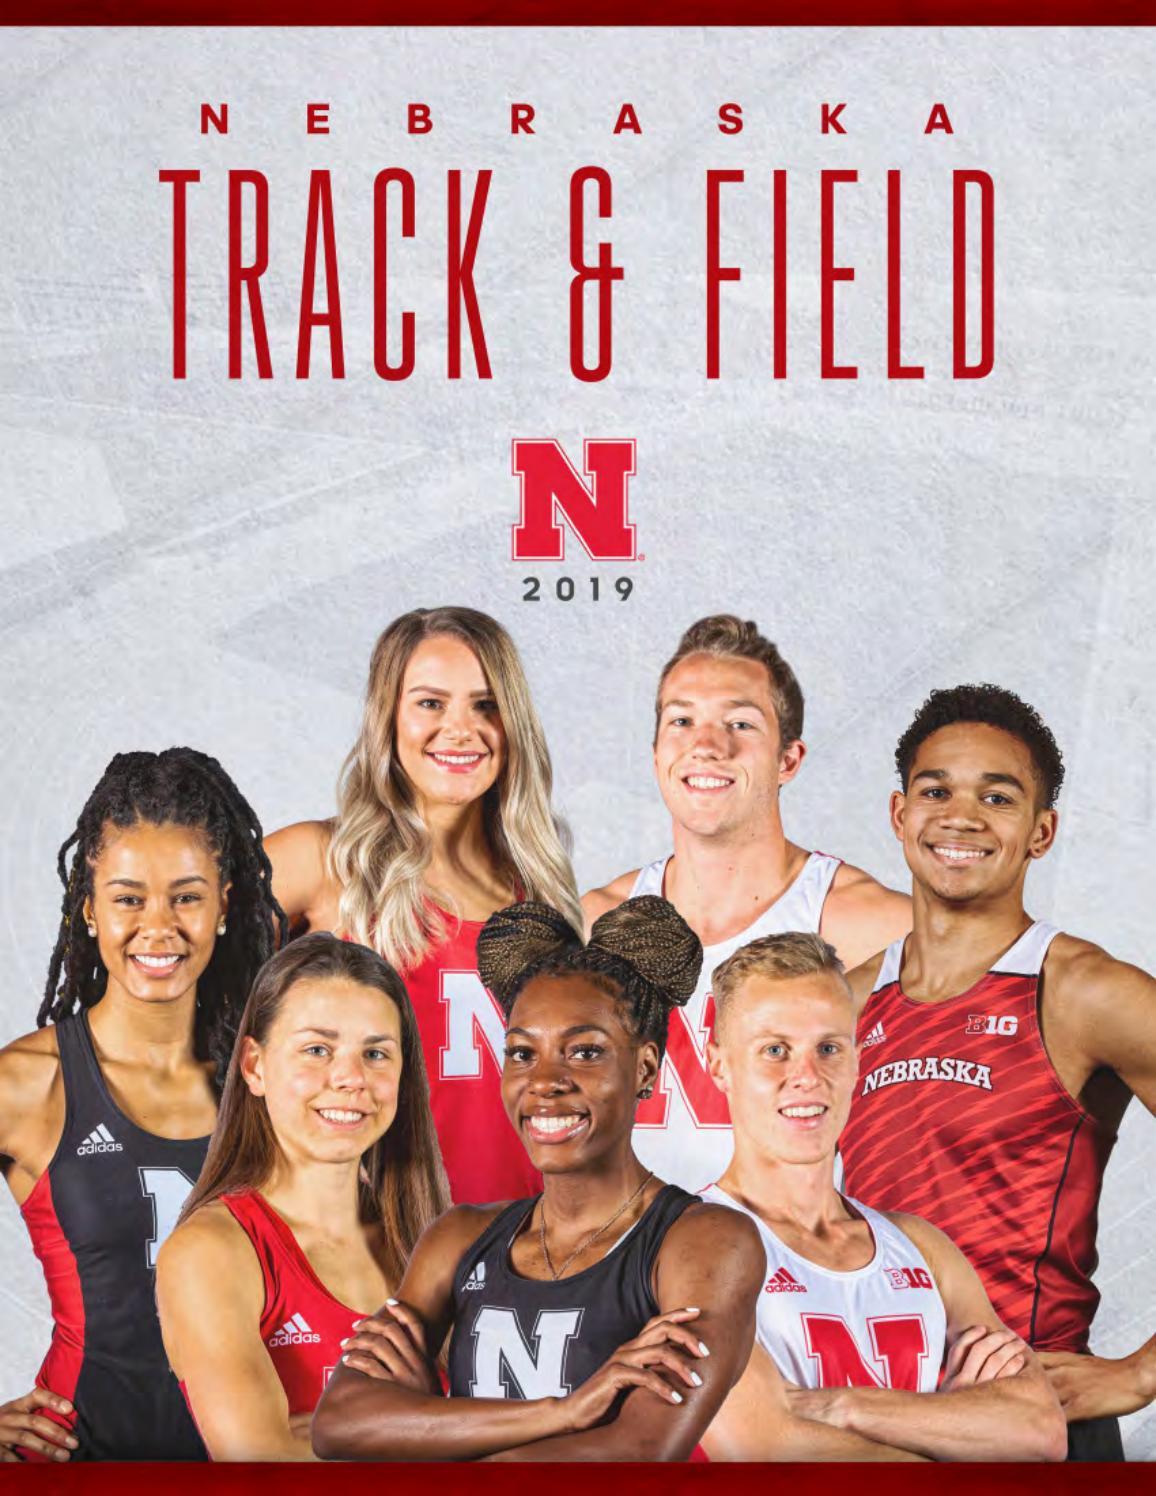 beeb8da115f476 2019 Nebraska Track   Field Media Guide by Jeremy Foote - issuu